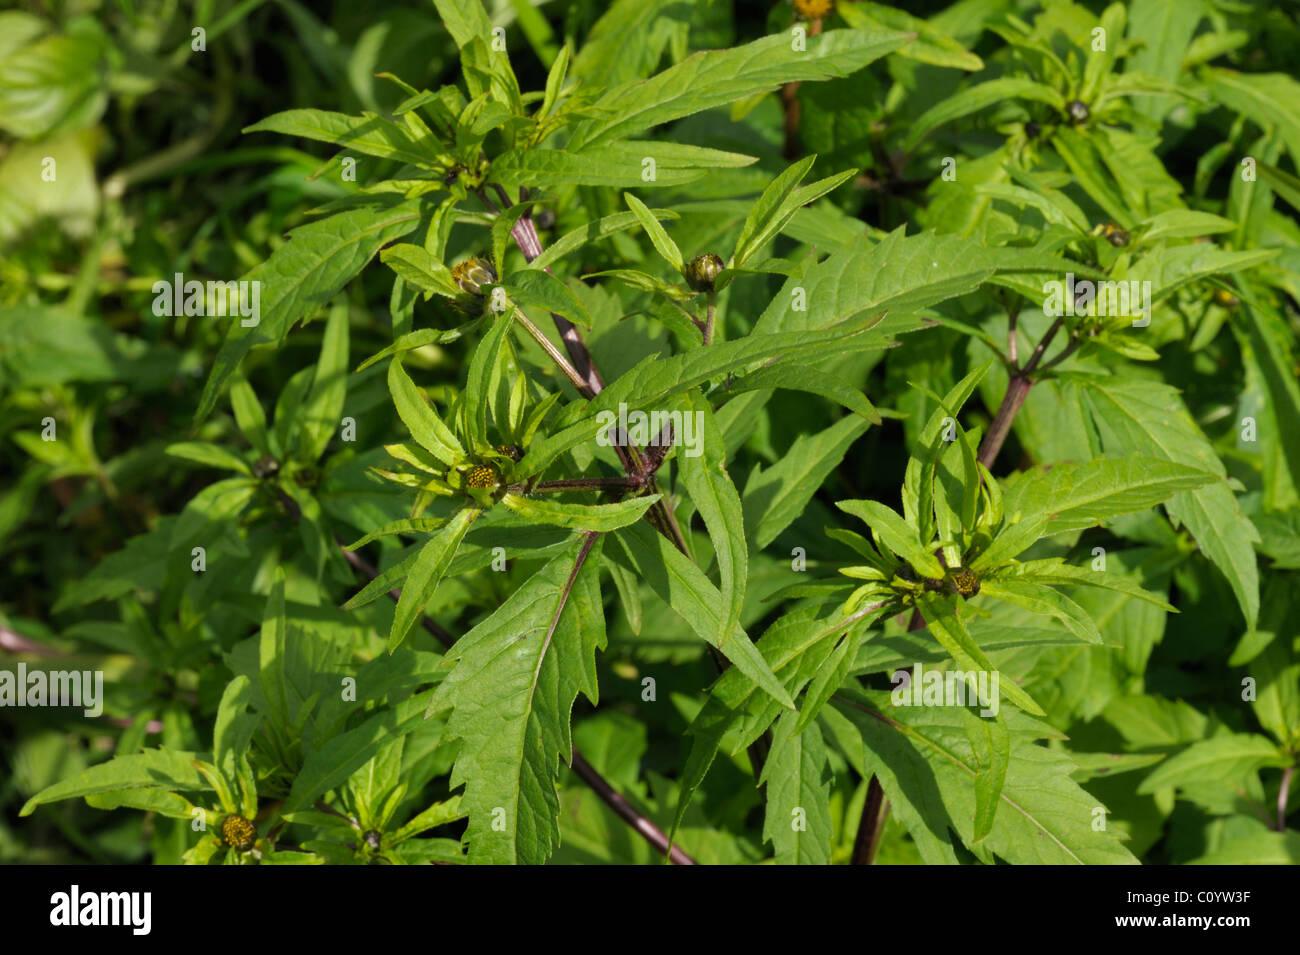 Trifid Bur-marigold, bidens tripartita - Stock Image